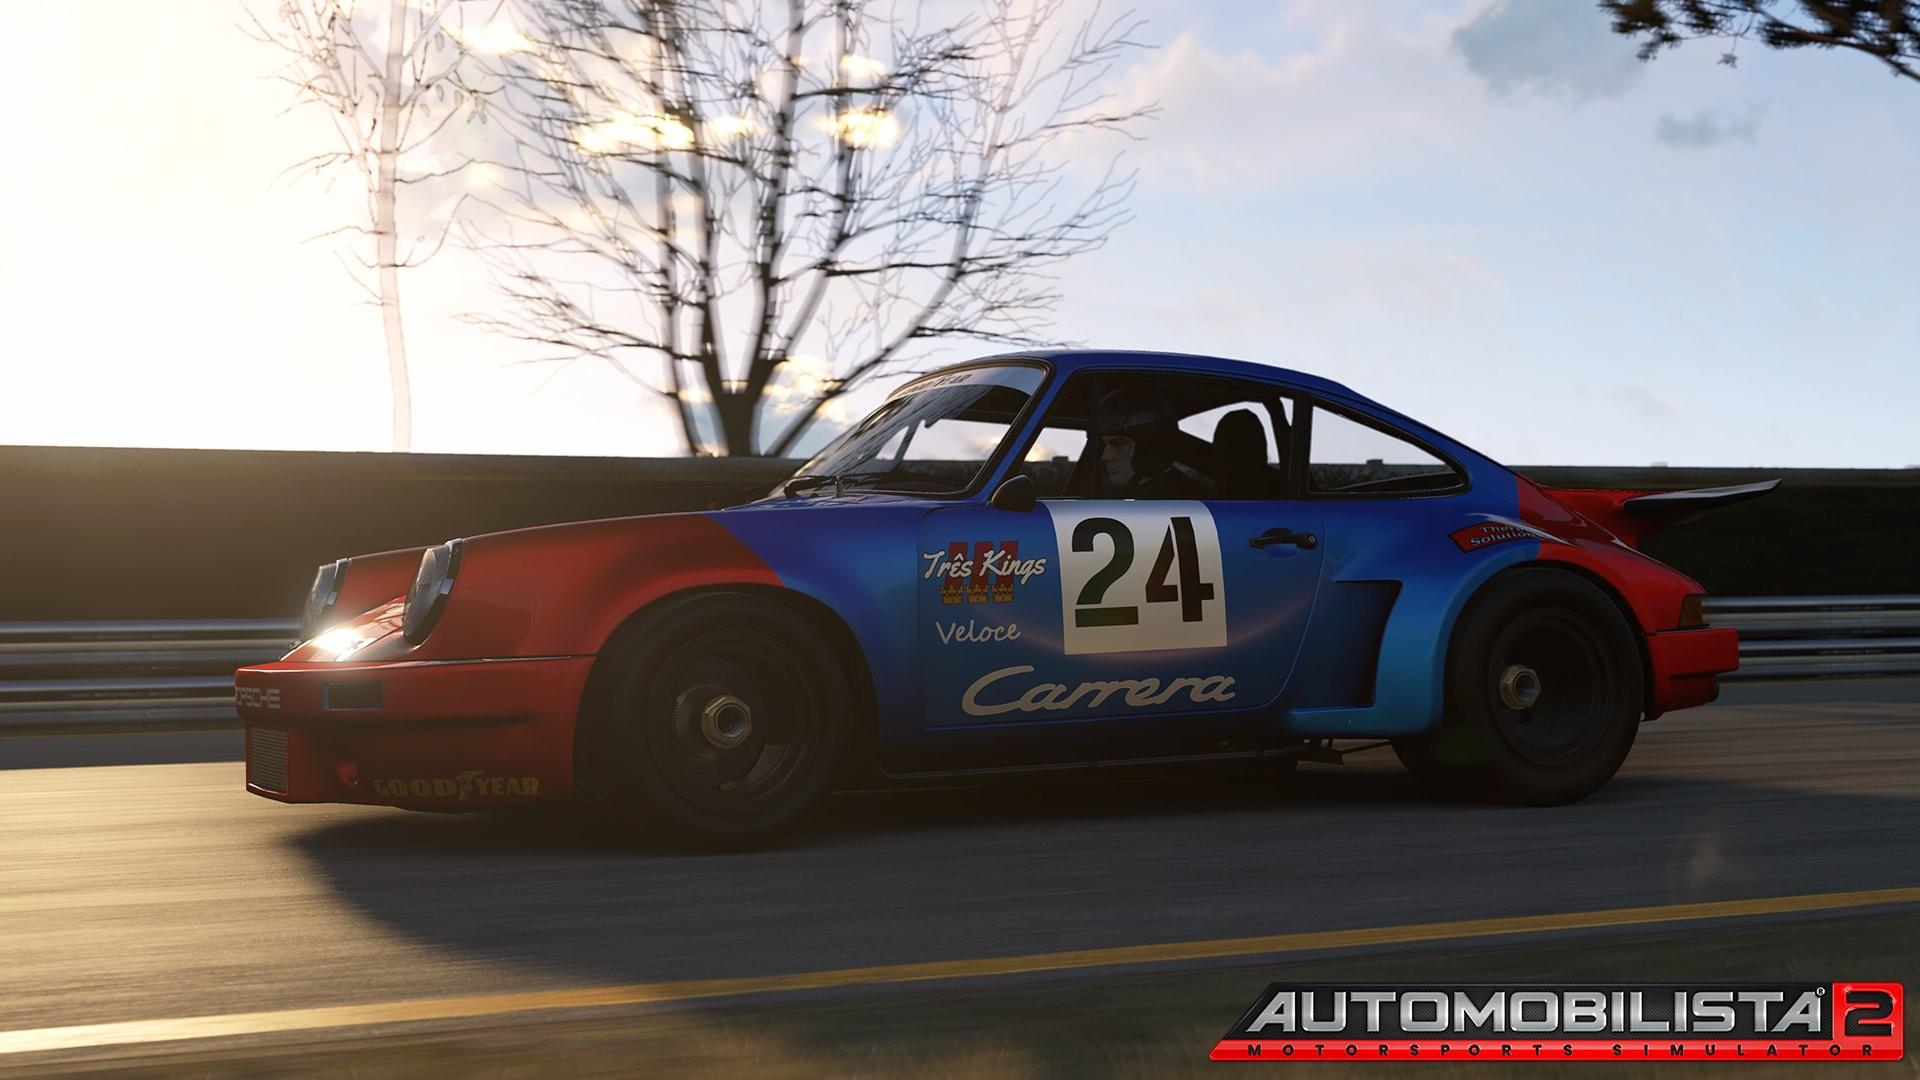 5 Automobilista 2 - Update V1.2.2.0